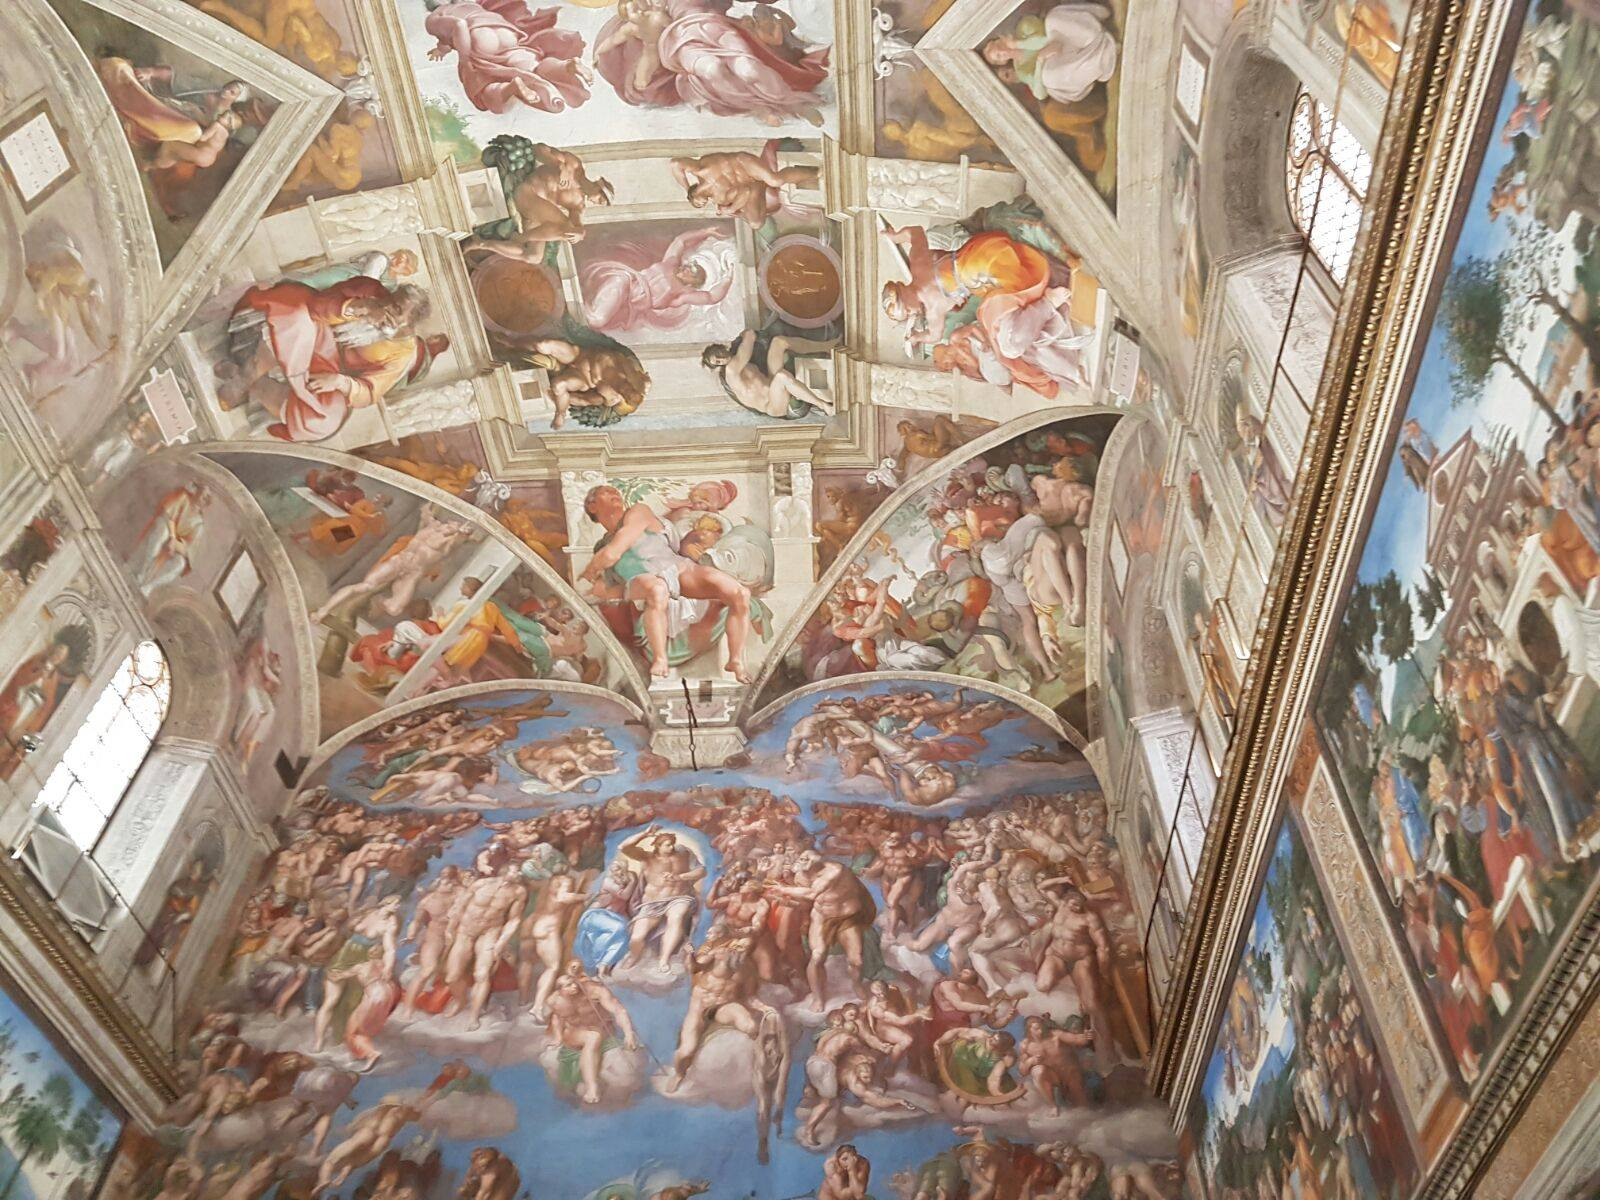 chapelle-Sixtine-vatican